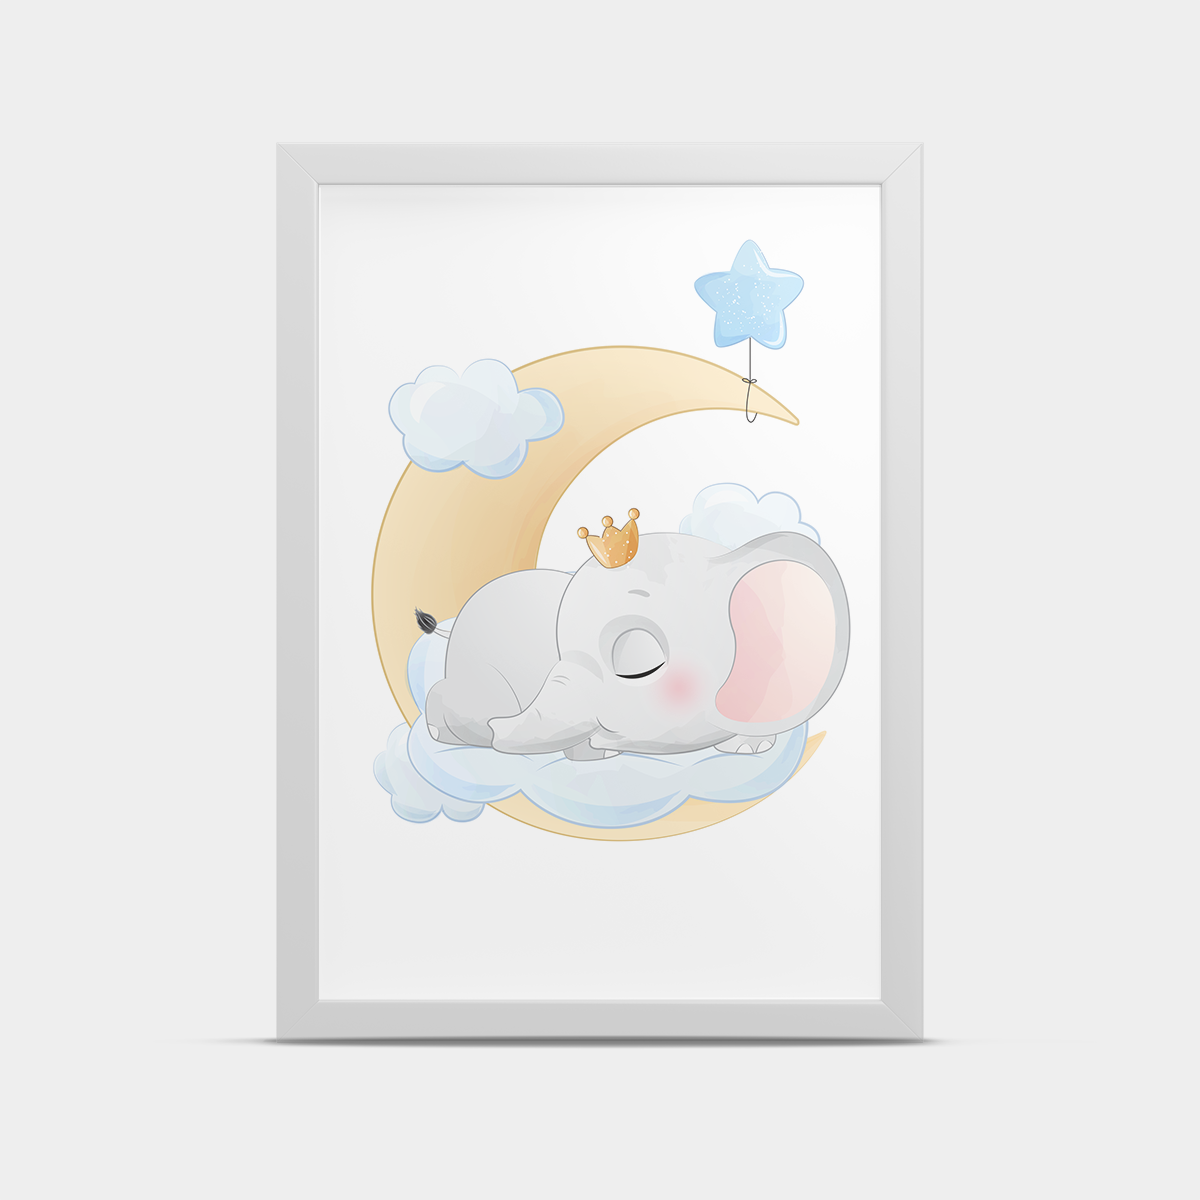 Постер на стену Слоник на луне Голубой 30*40 см